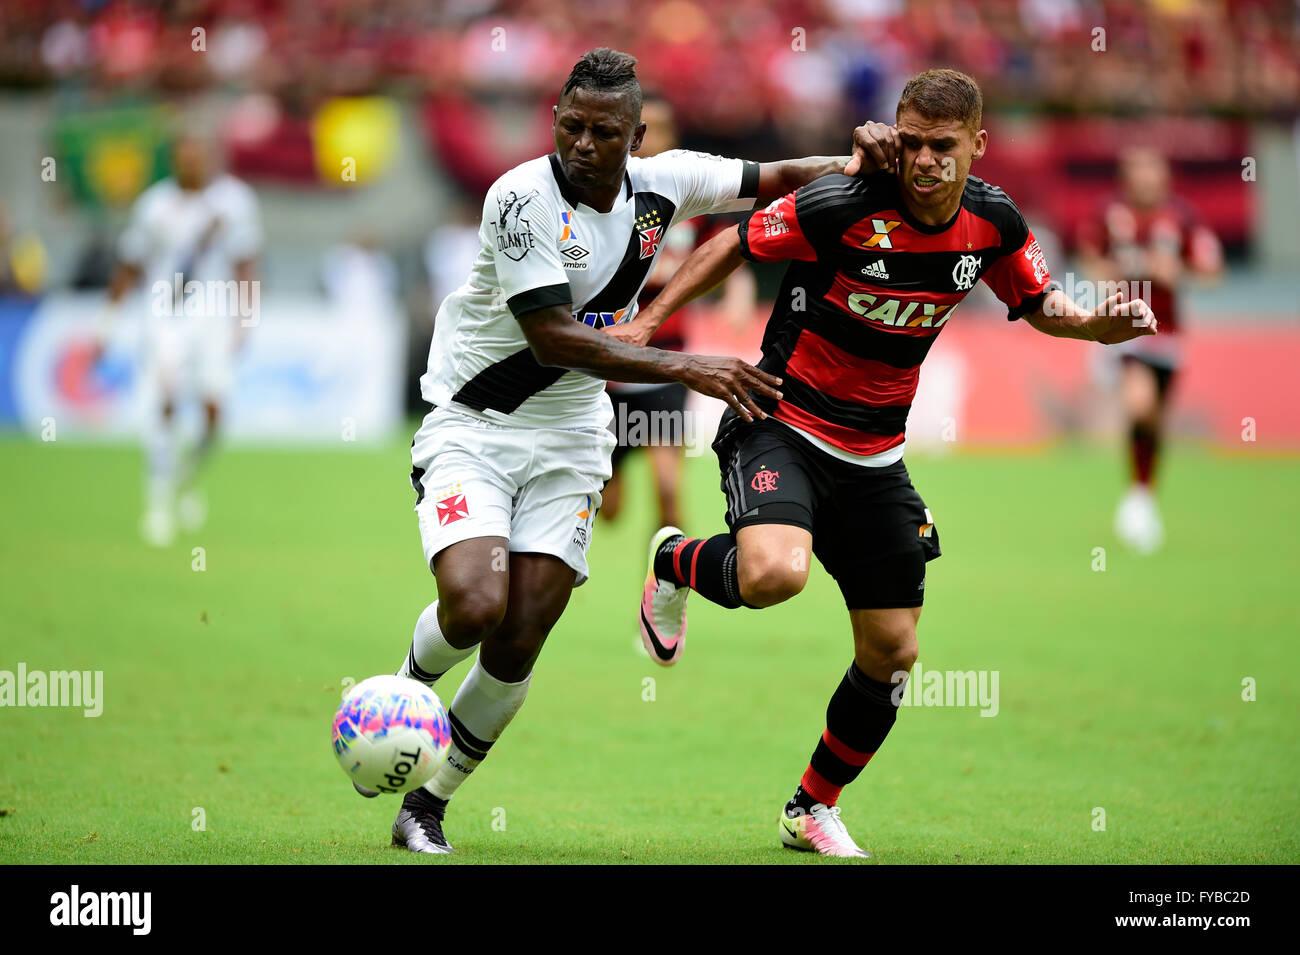 MANAUS, AM - 04/24/2016: FLAMINGO X VASCO - ball match during Flamengo x Vasco held at the Arena da Amaz?nia. (Photo: - Stock Image